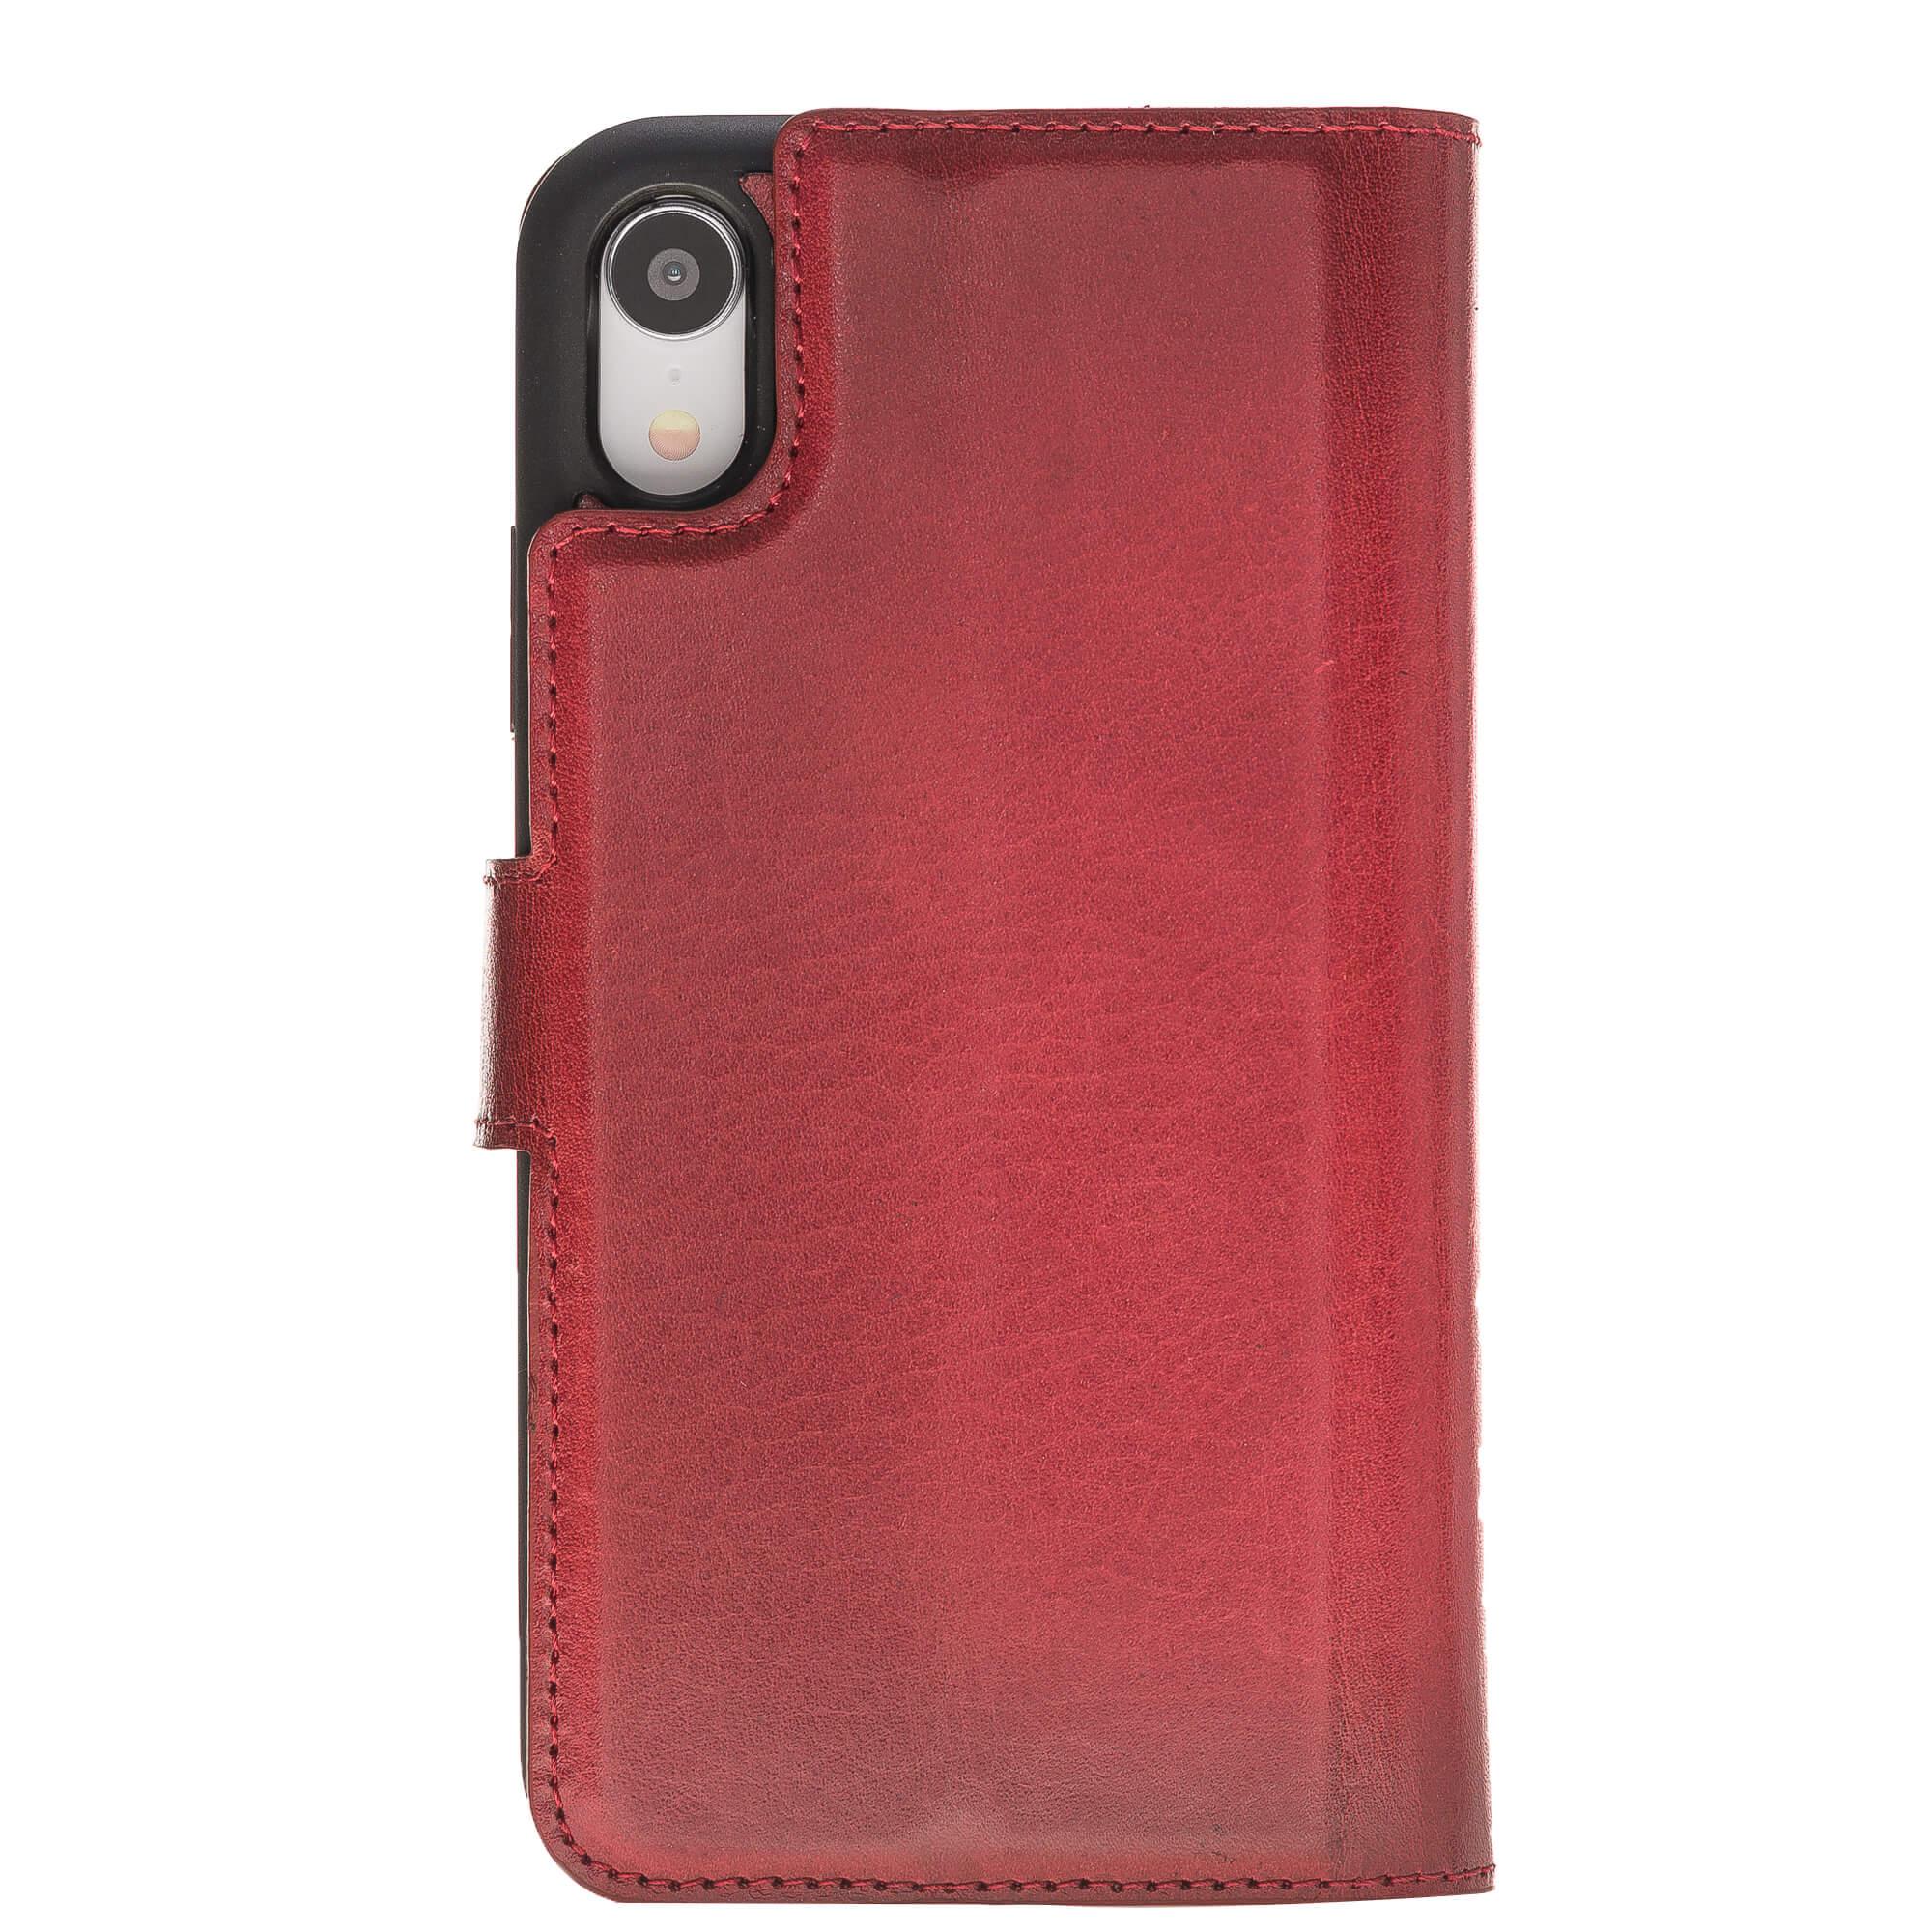 "iPhone Xr abnehmbare Lederhülle ""Darian"" inkl. Kartenfächer in Rot Burned inkl. Edler Geschenkverpackung"